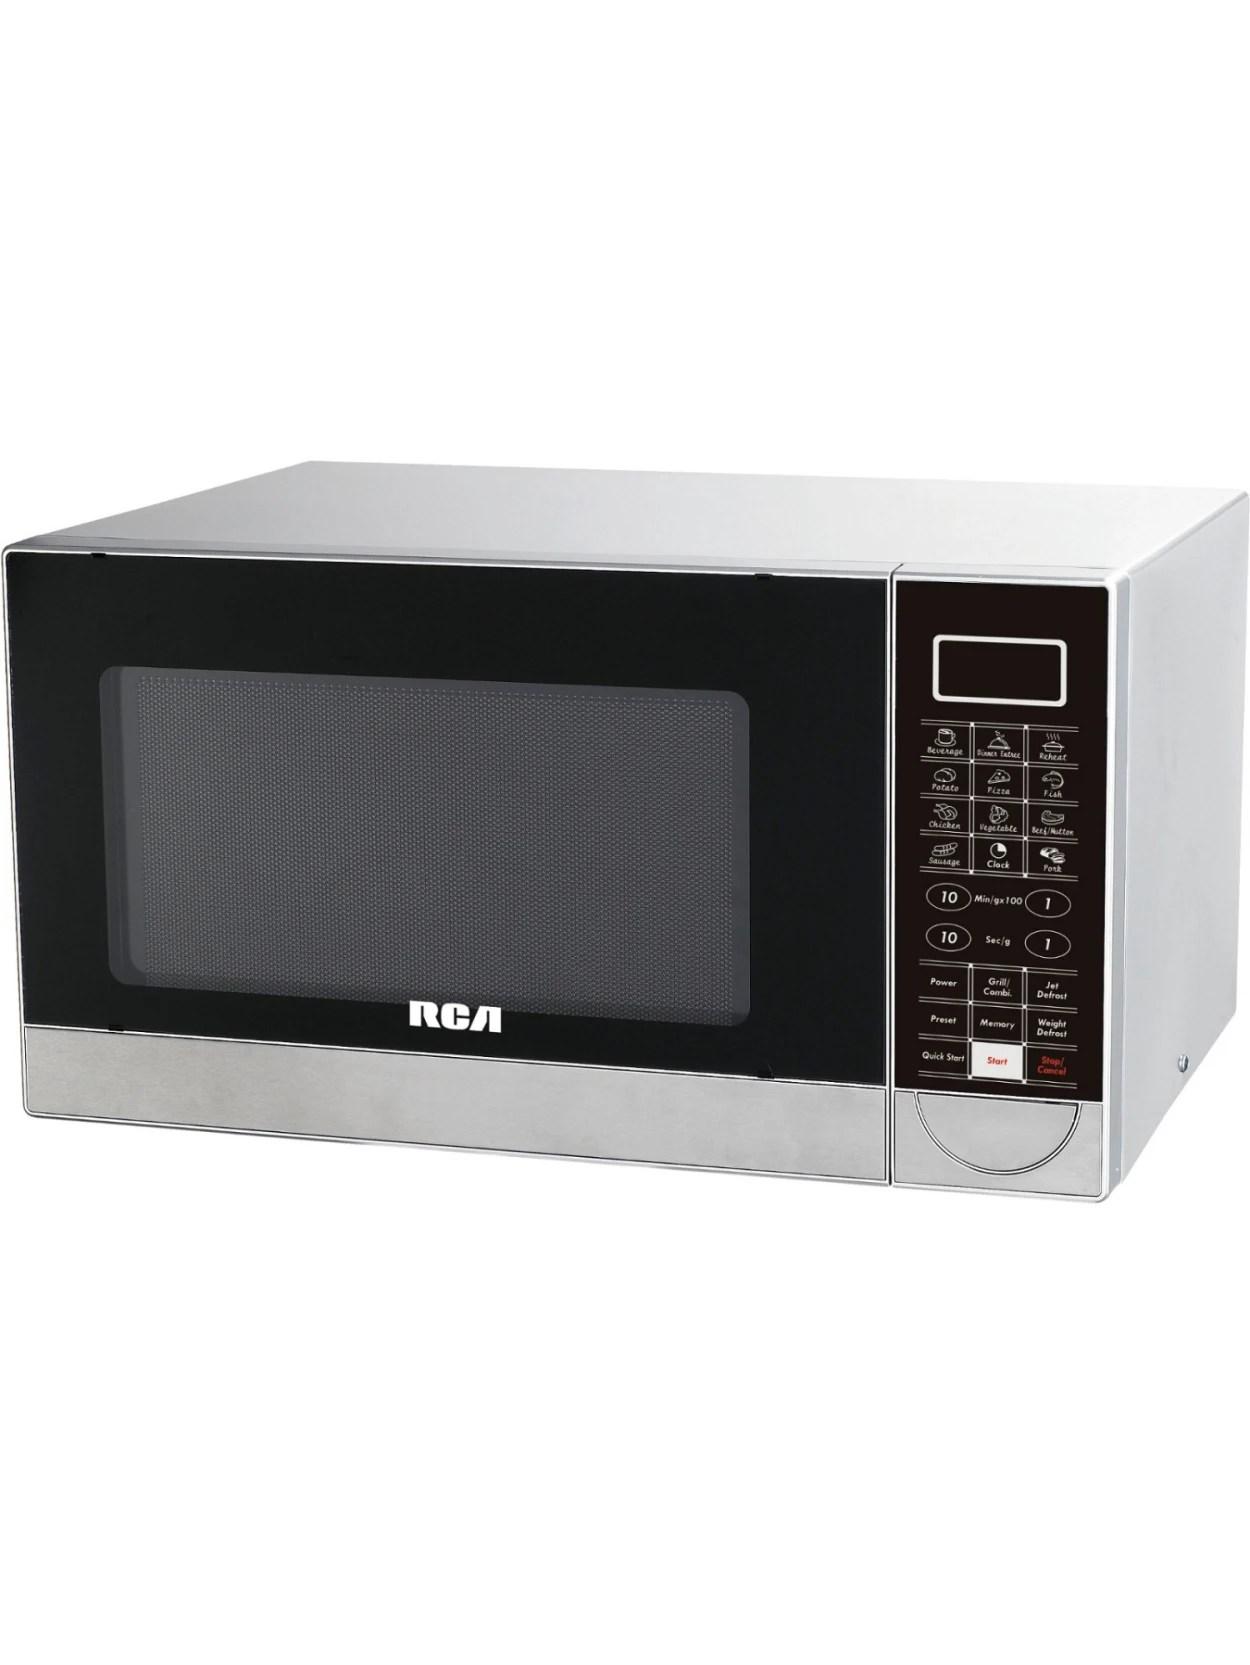 rca rmw1182 microwave oven single 8 23 gal capacity microwave grilling 10 power levels 1000 w microwave power 1000 w grill power